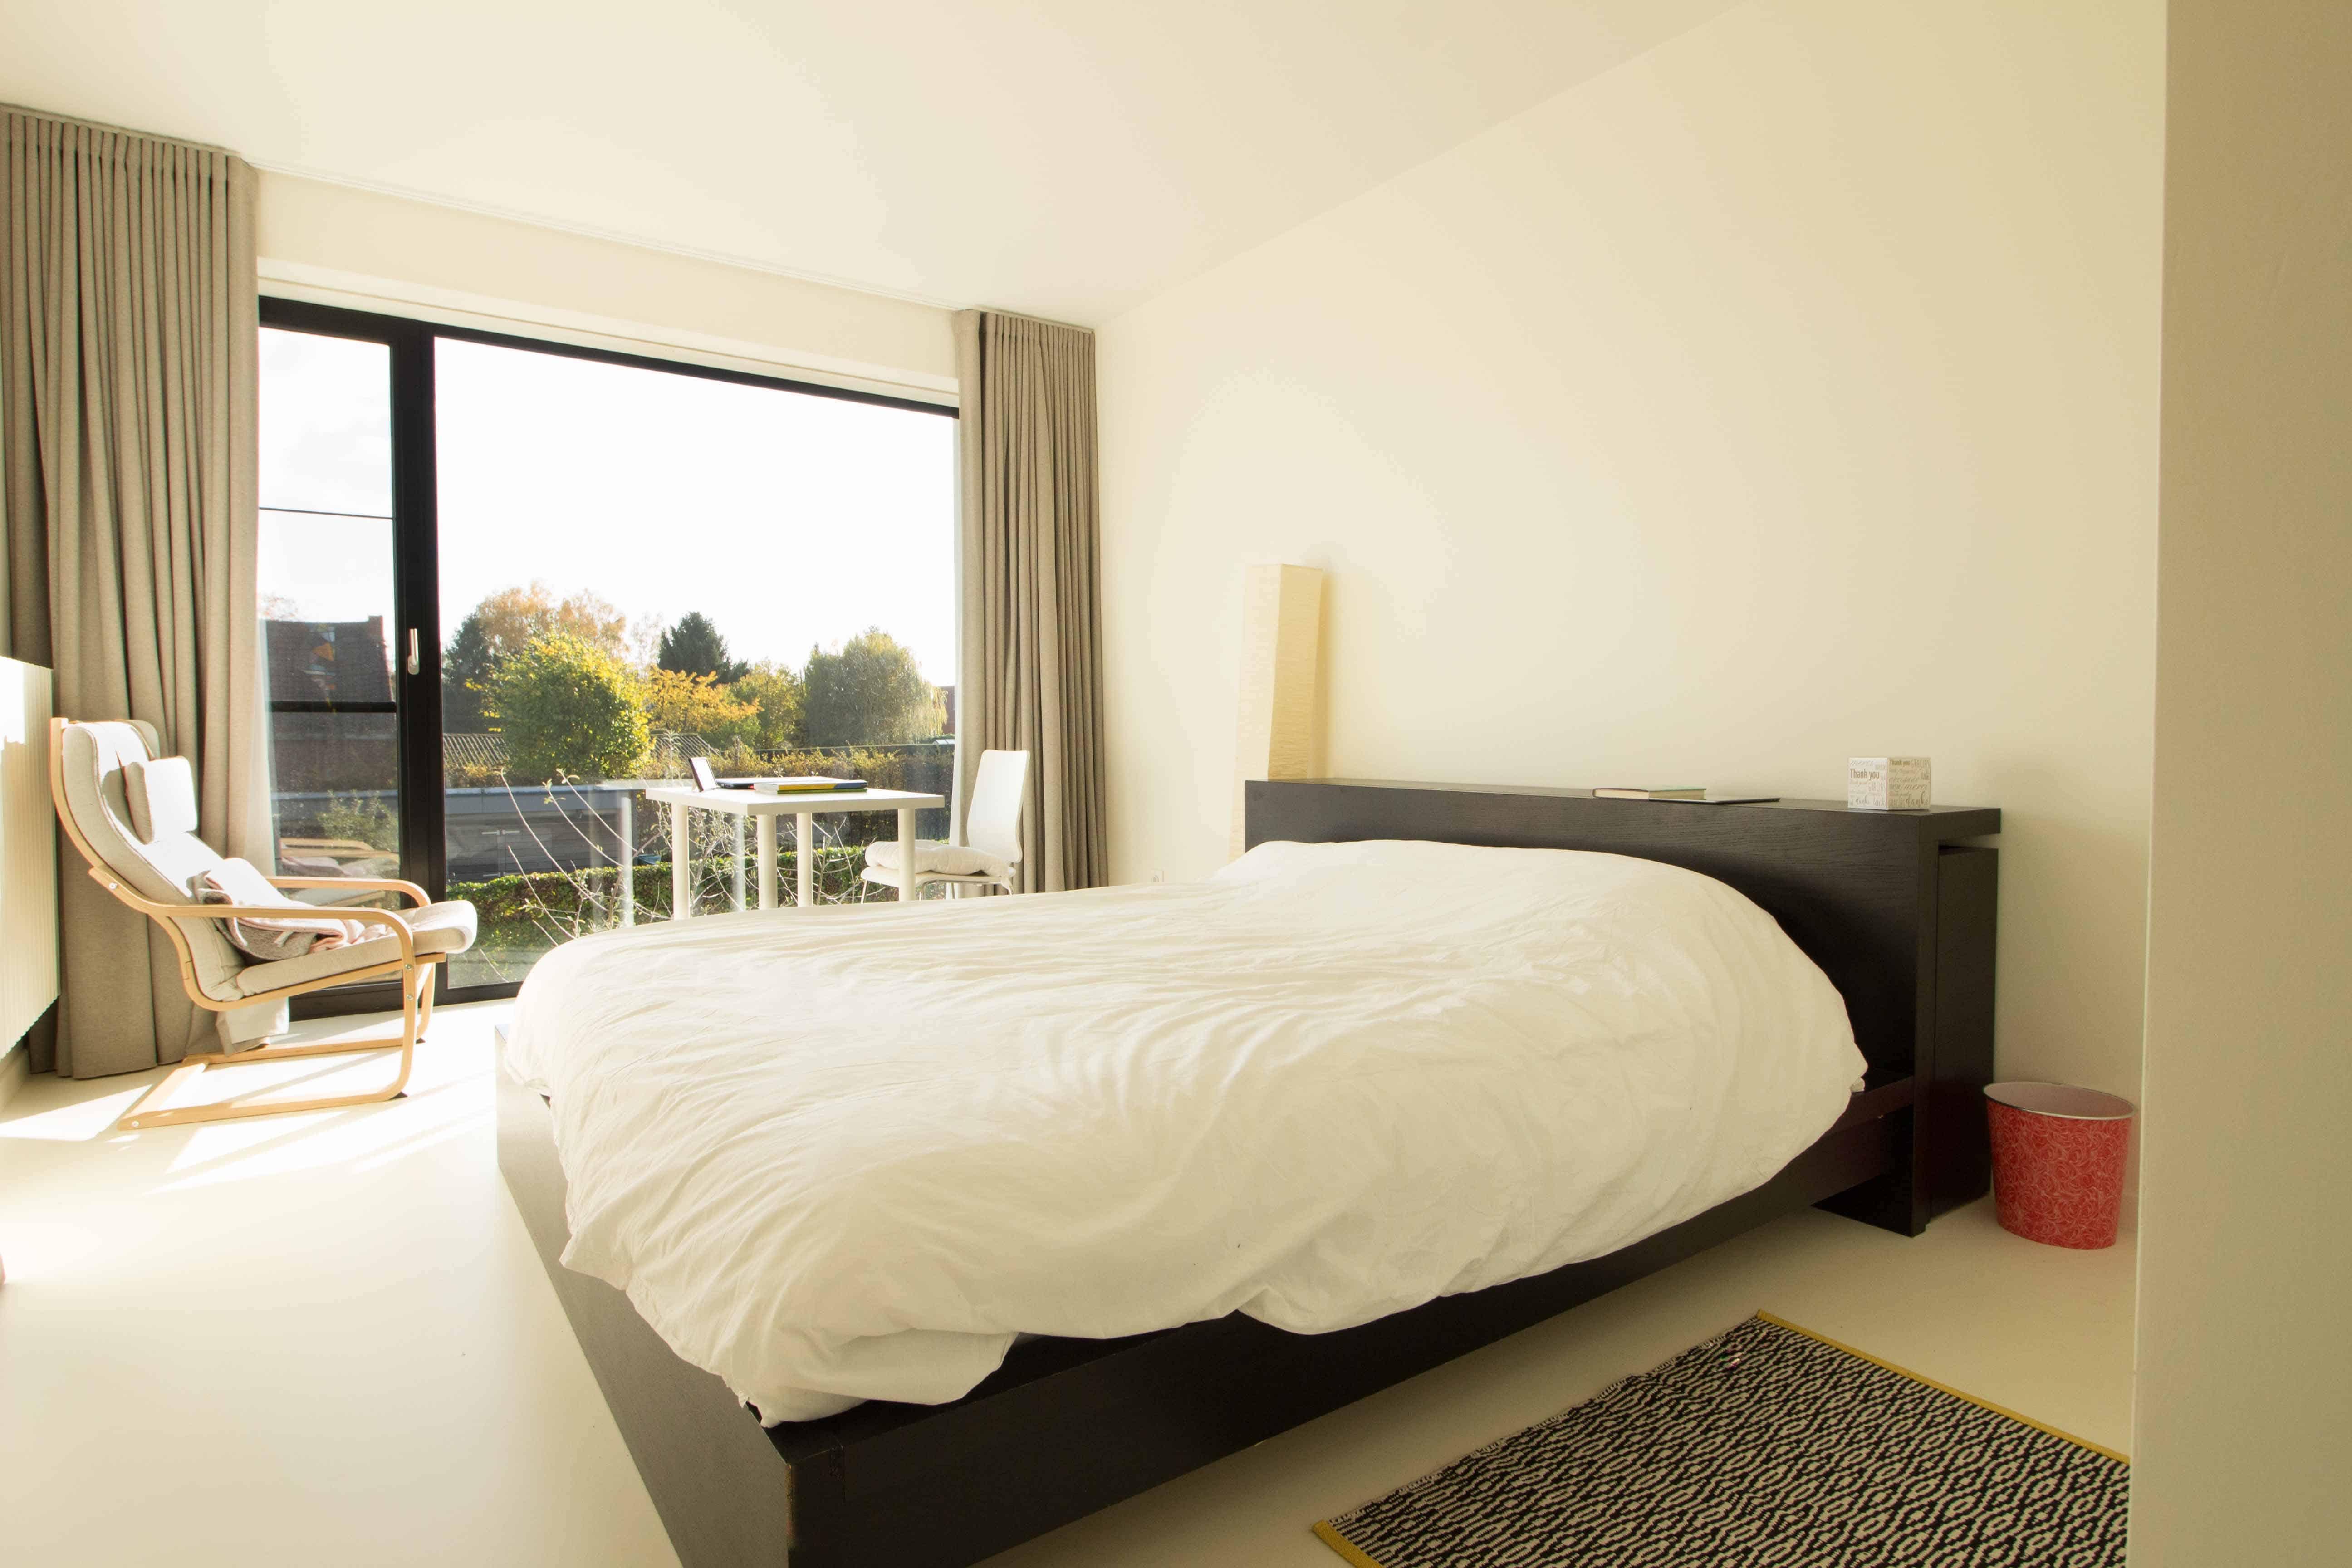 gasten slaapkamer in villa2